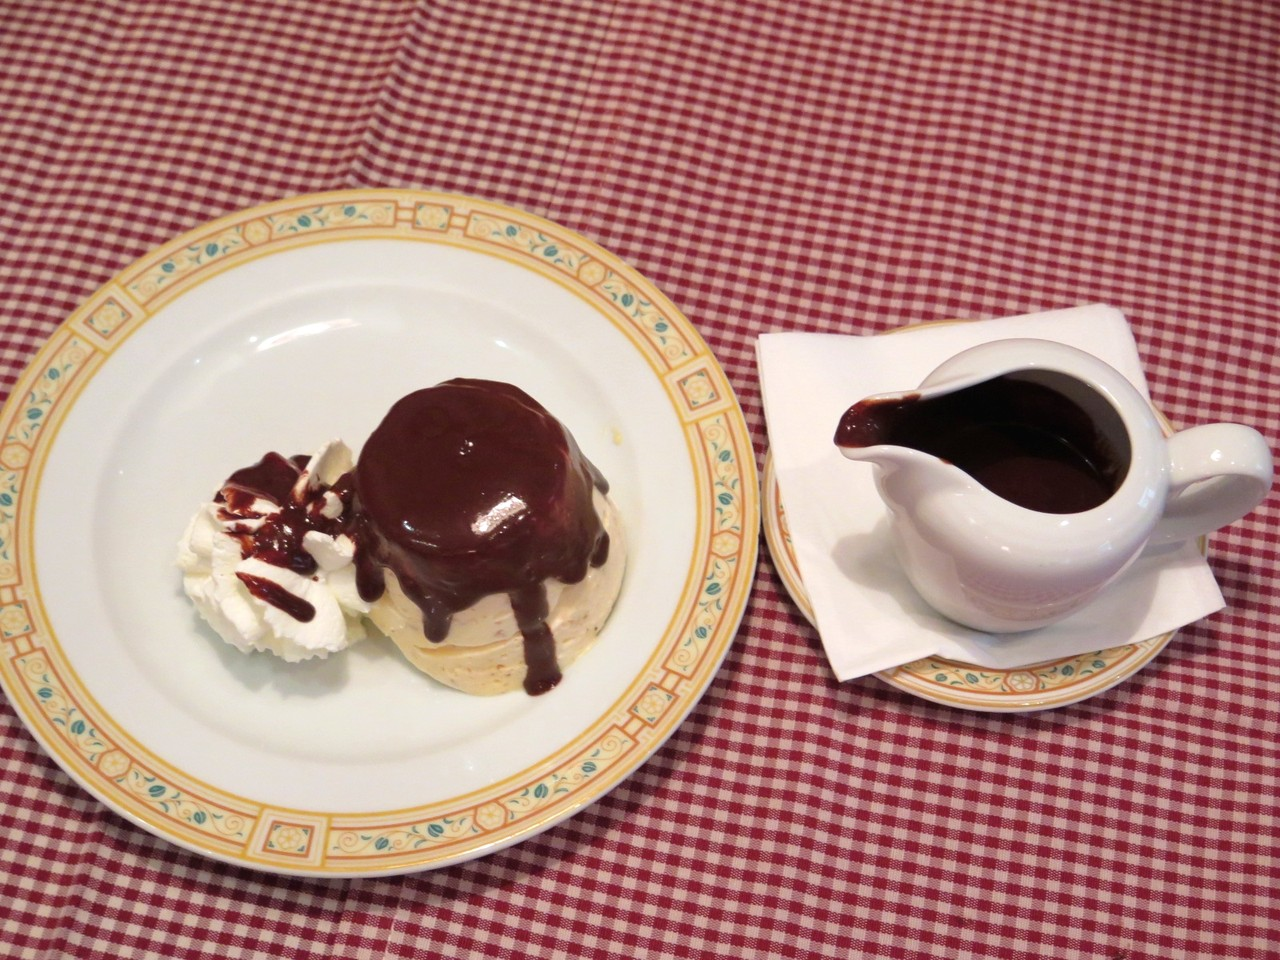 Semifredo al Torroncino con Cioccolato Caldo